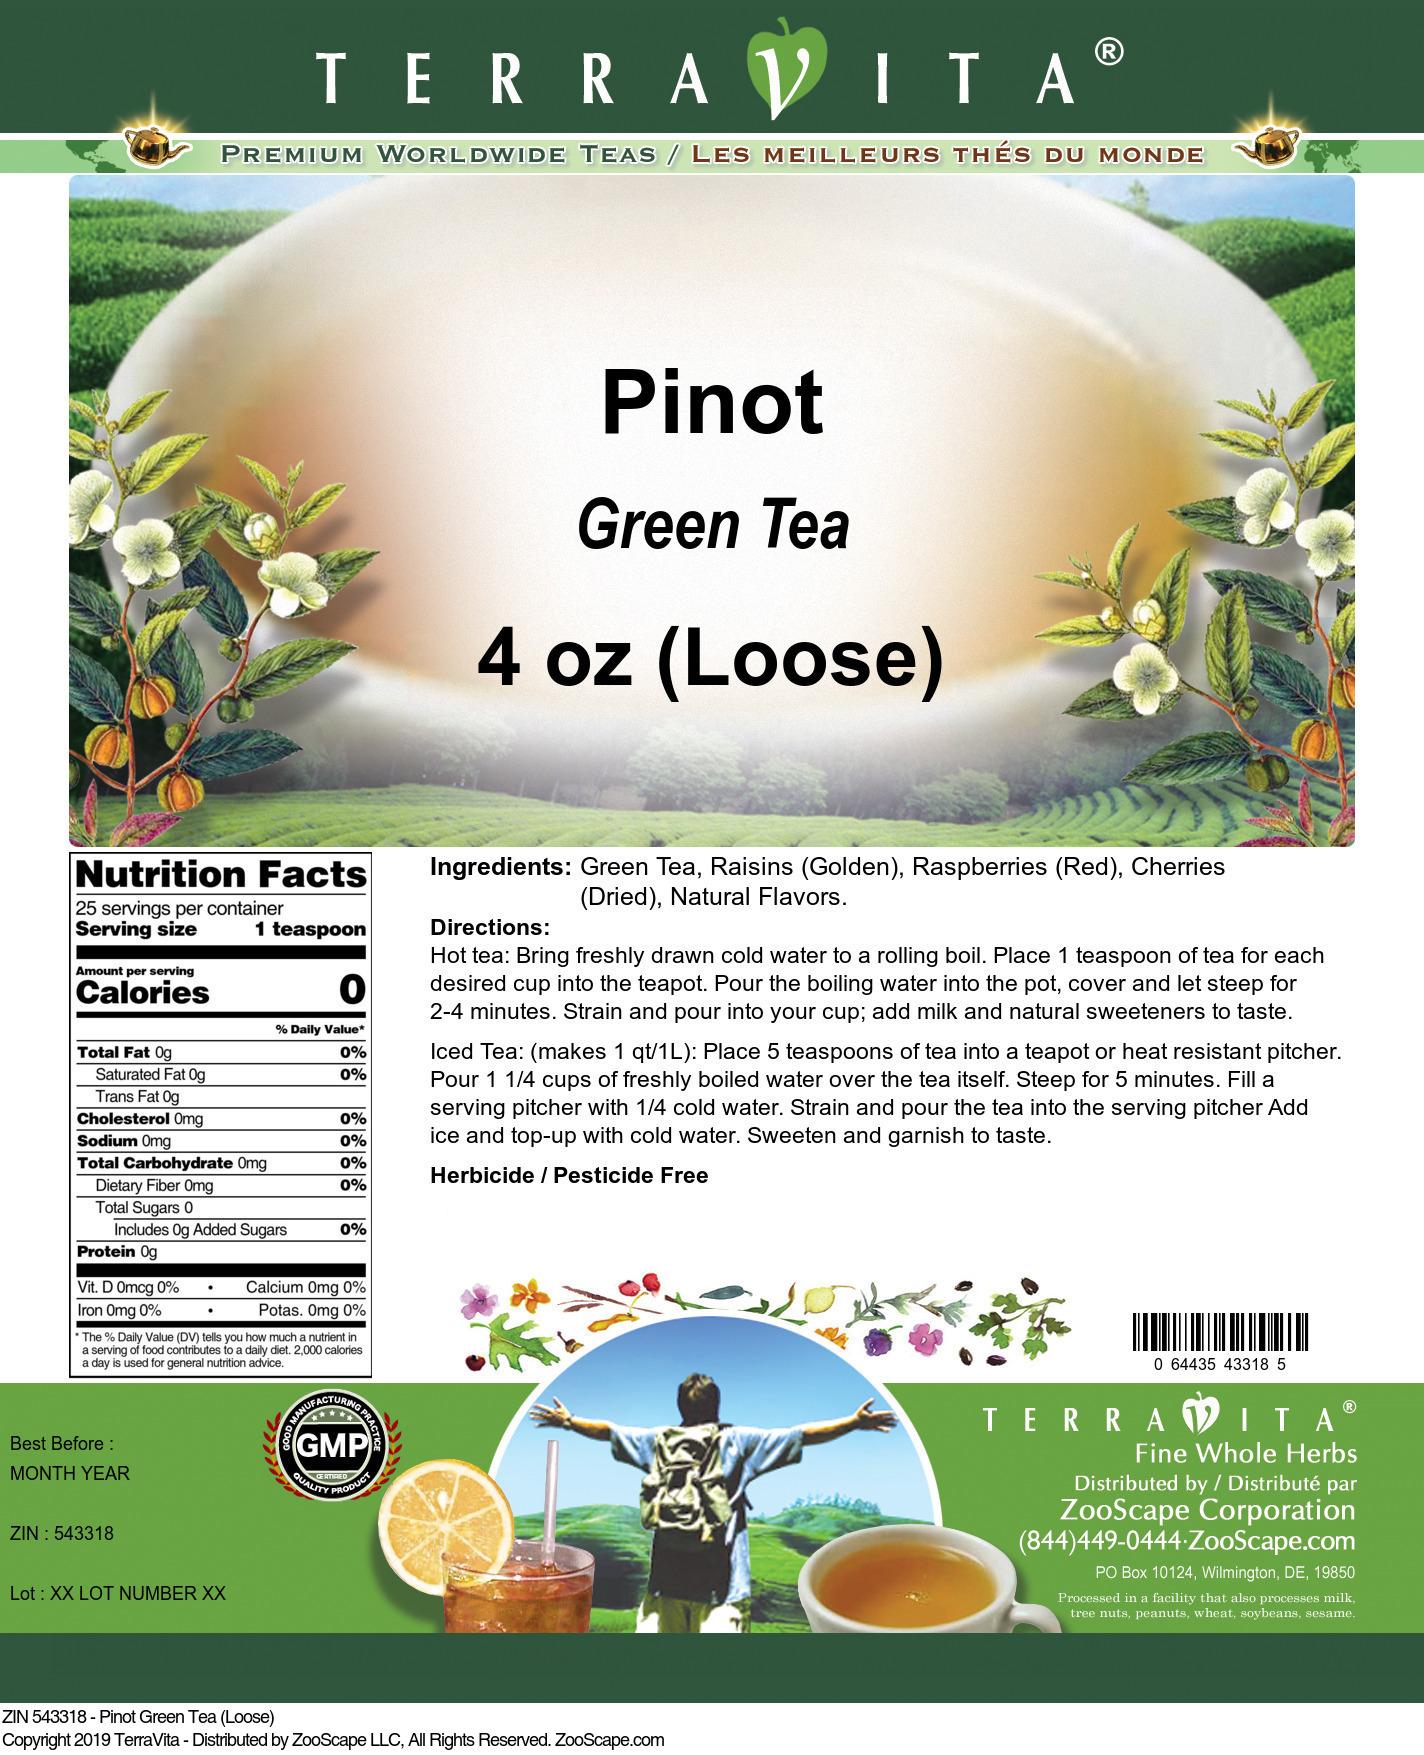 Pinot Green Tea